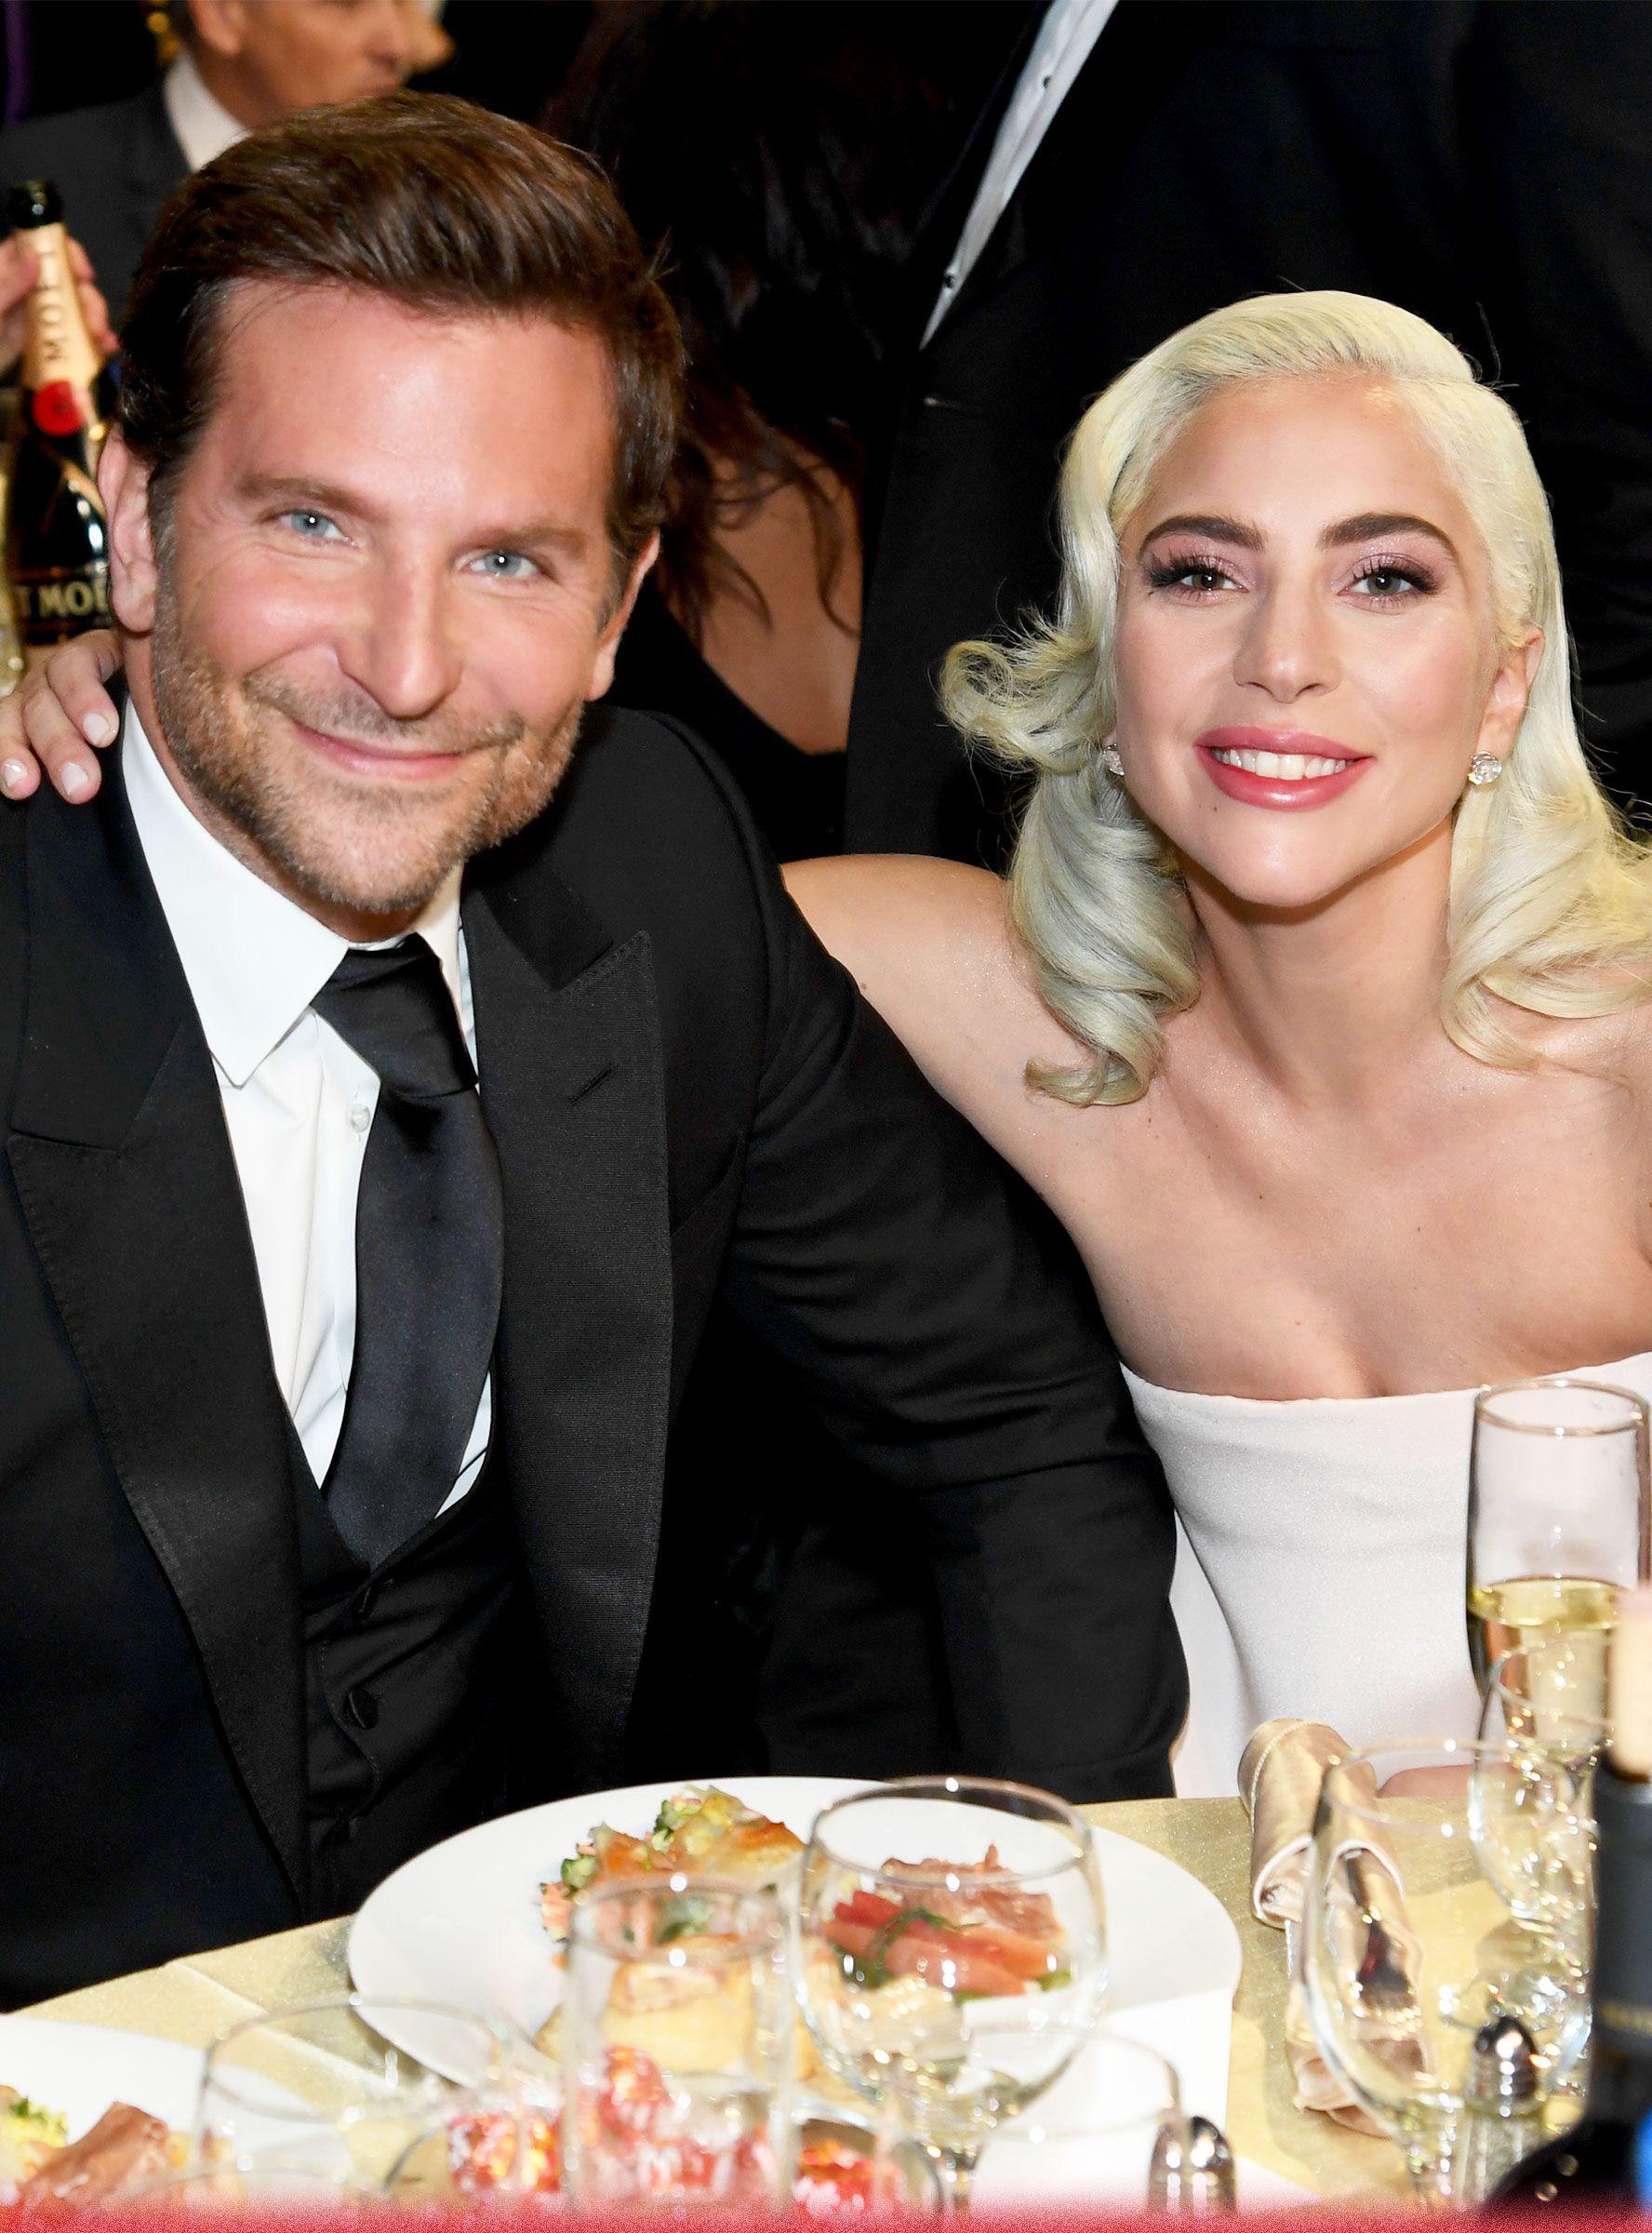 Lady Gaga S Ex Is Supporting Bradley Cooper S Ex At Least On Instagram Lady Gaga Awards Lady Gaga Bradley Cooper